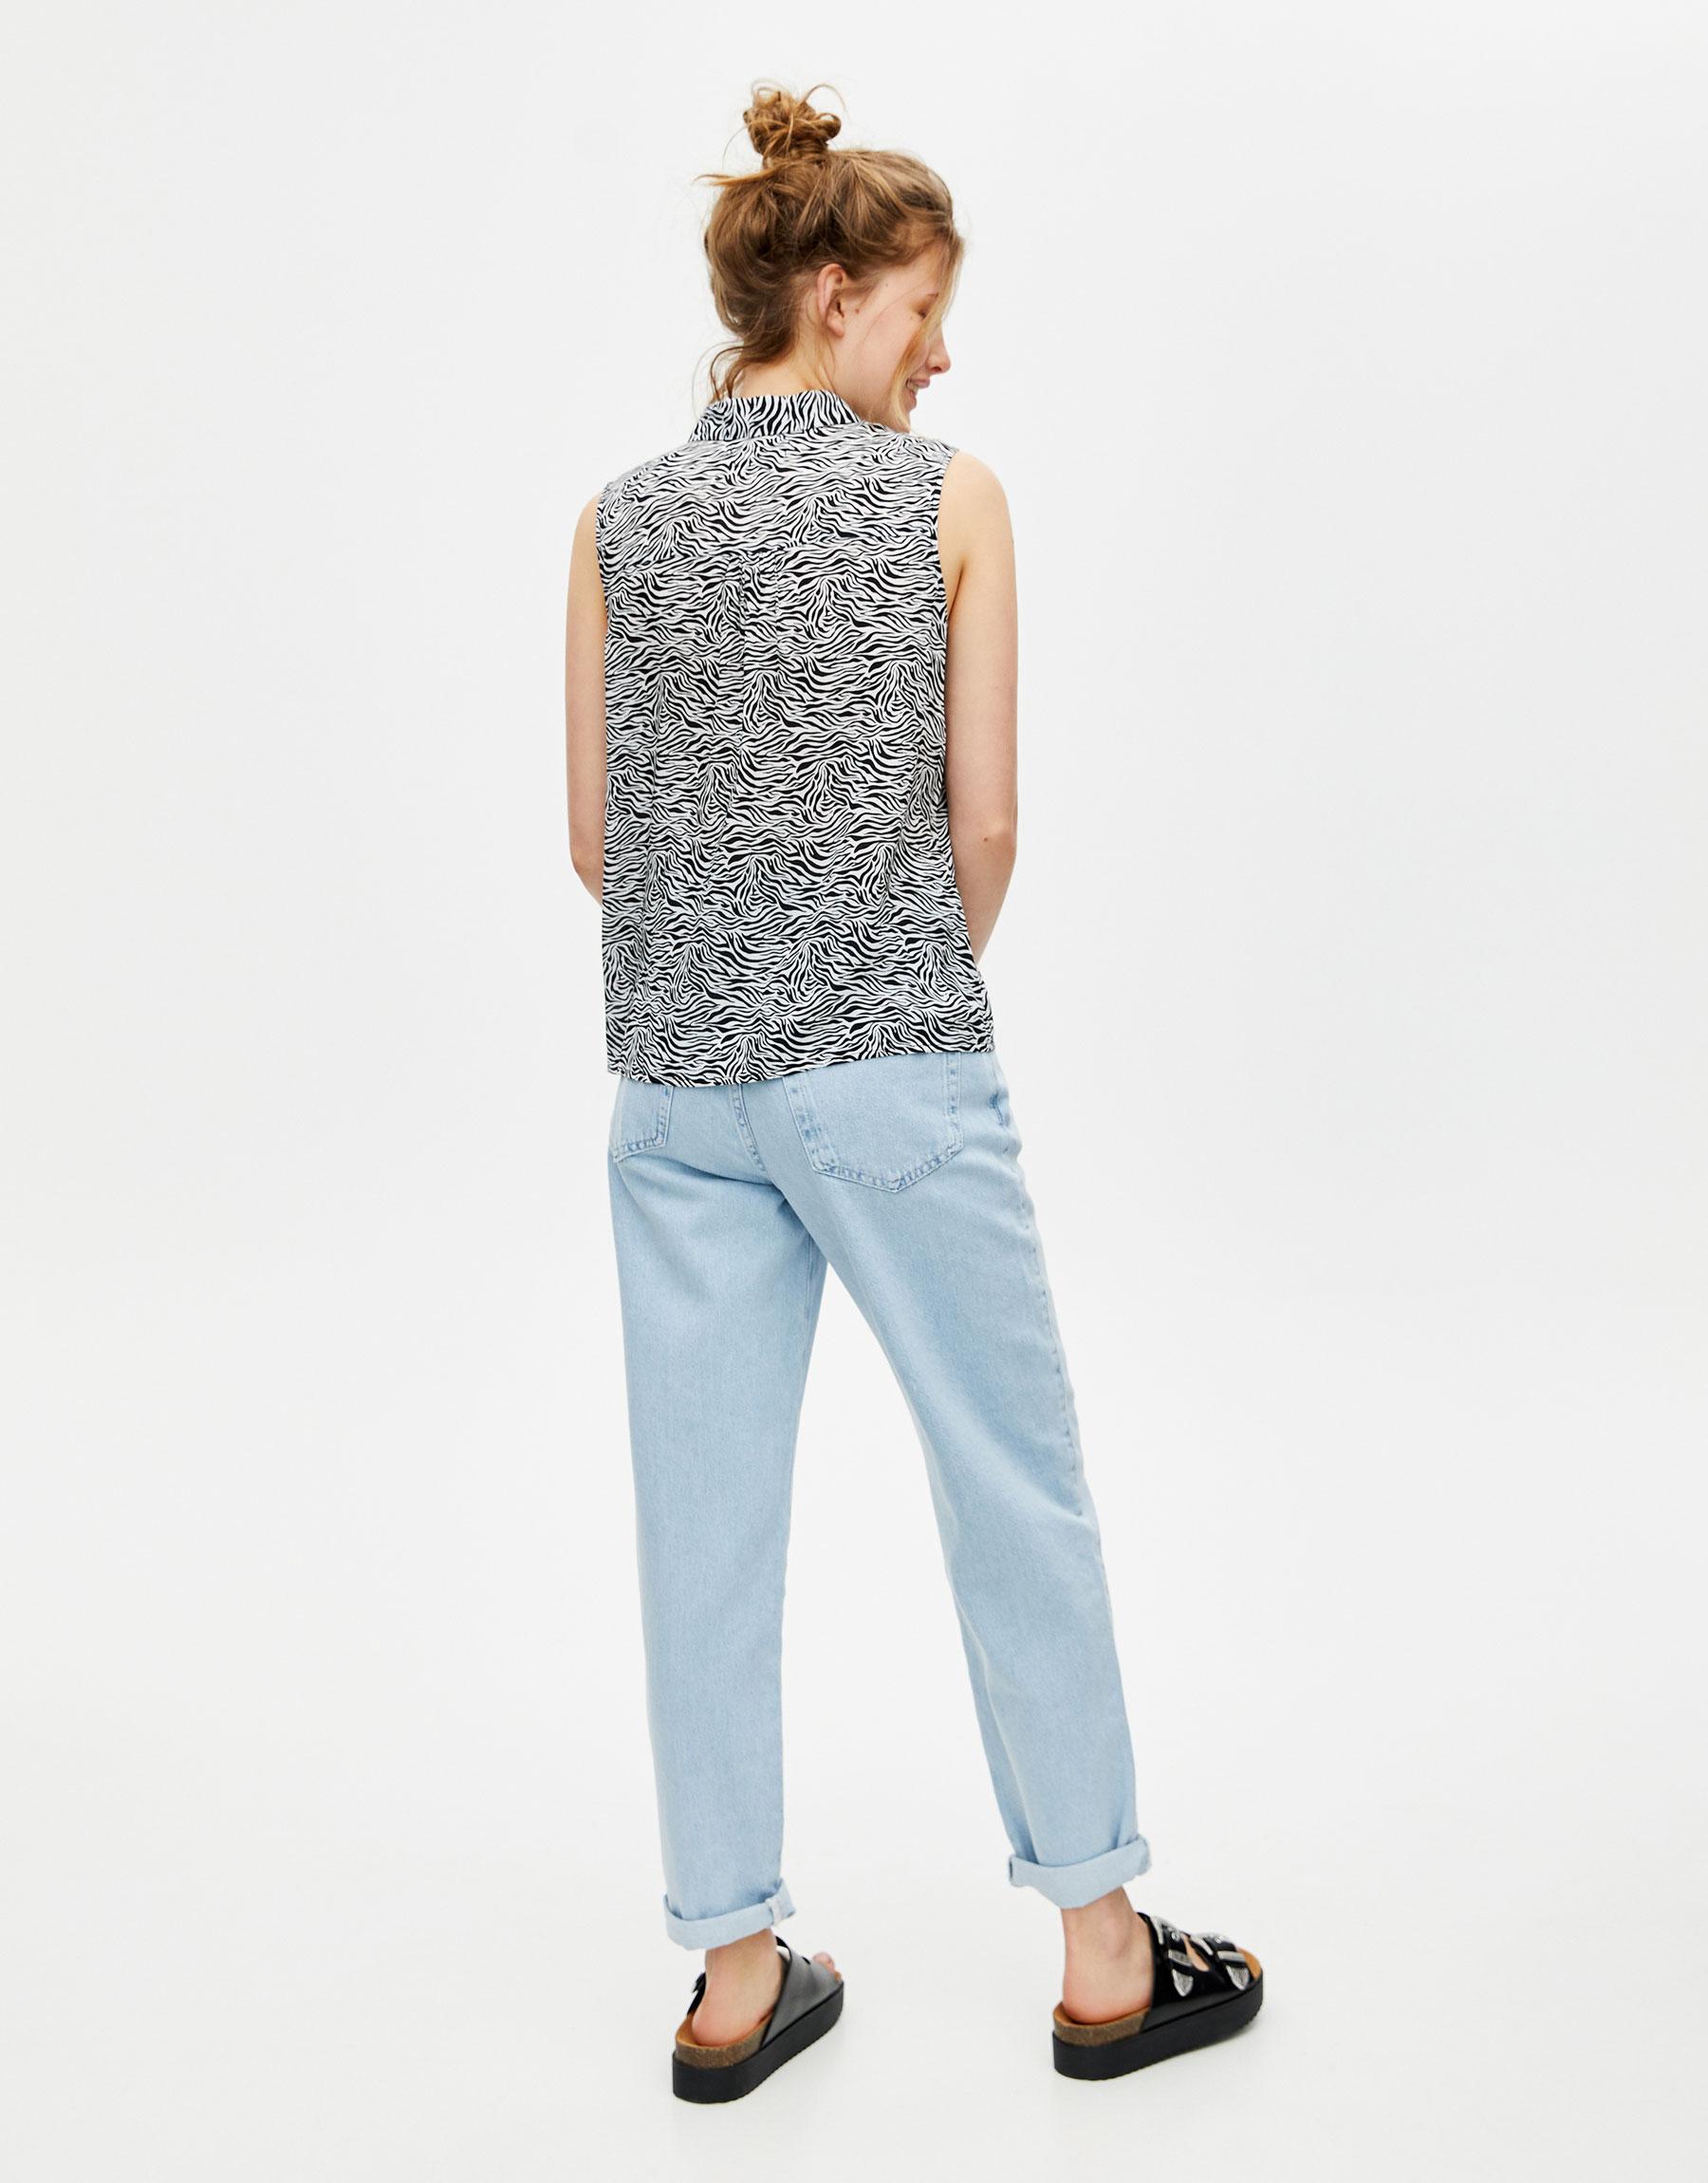 5606f6158b15 Modalite - Pullbear Printed sleeveless shirt